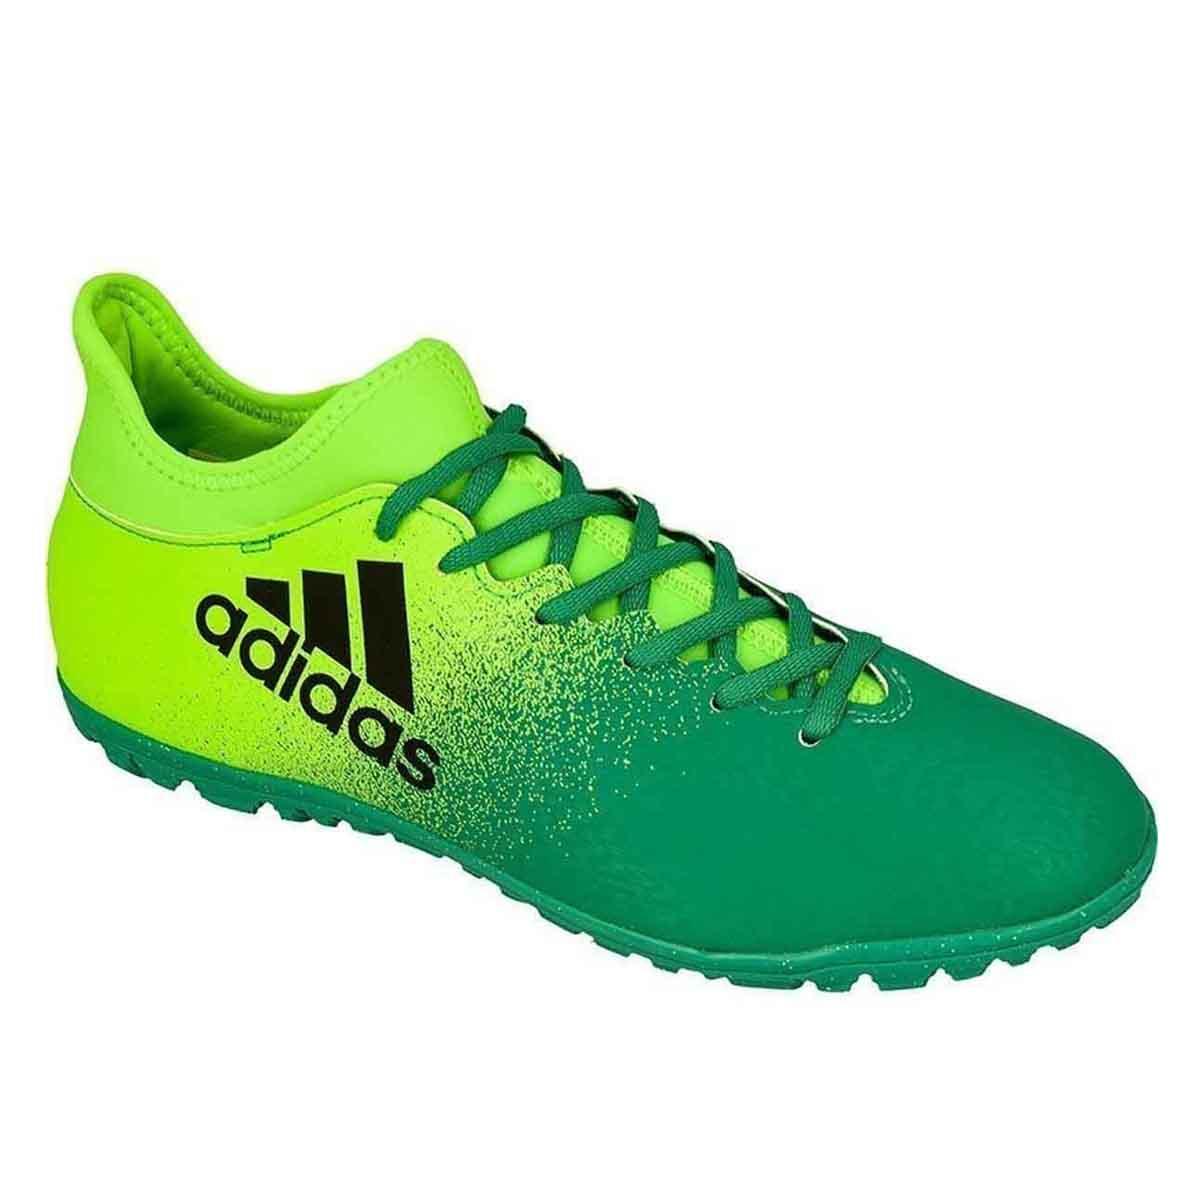 ffe44864e260 Buy Adidas X 16.3 Turf Football Shoes (Green) Online India